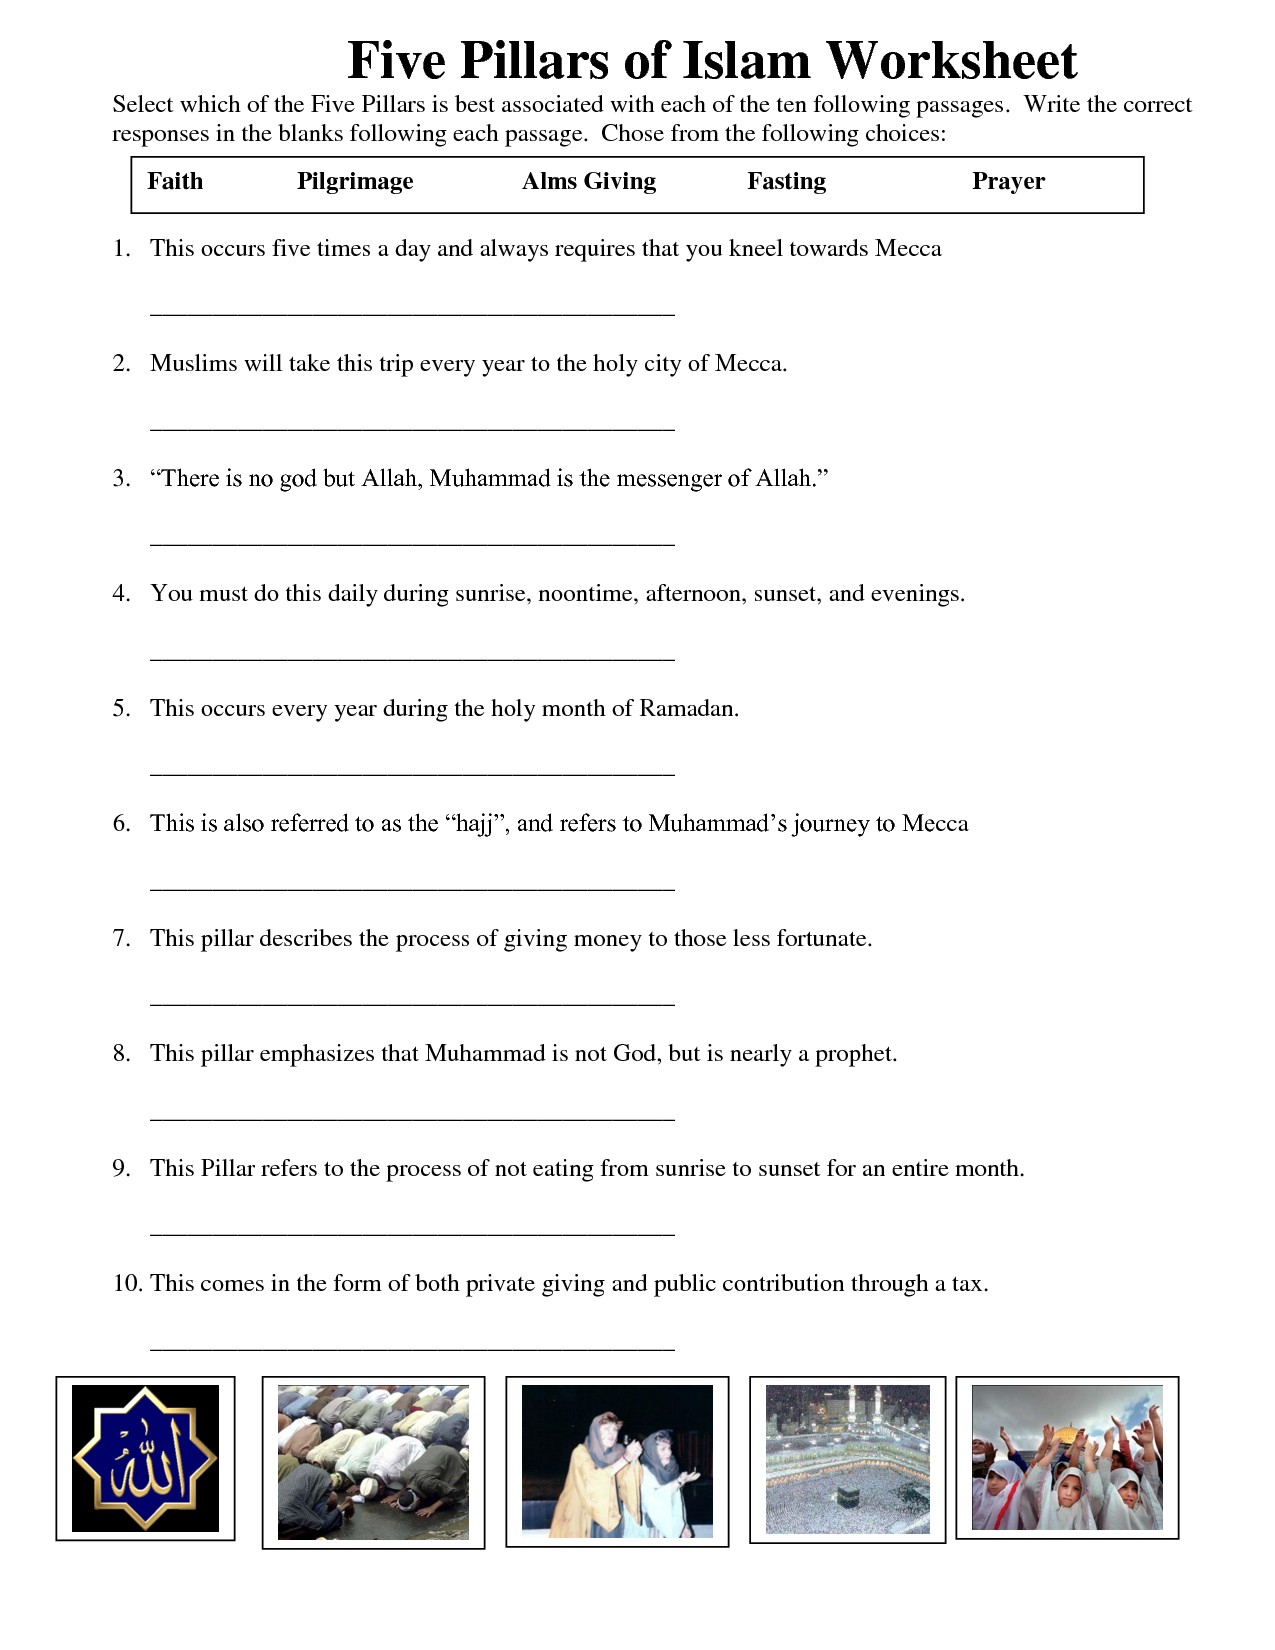 Five Pillars Of Islam W S Learnarabicworksheets